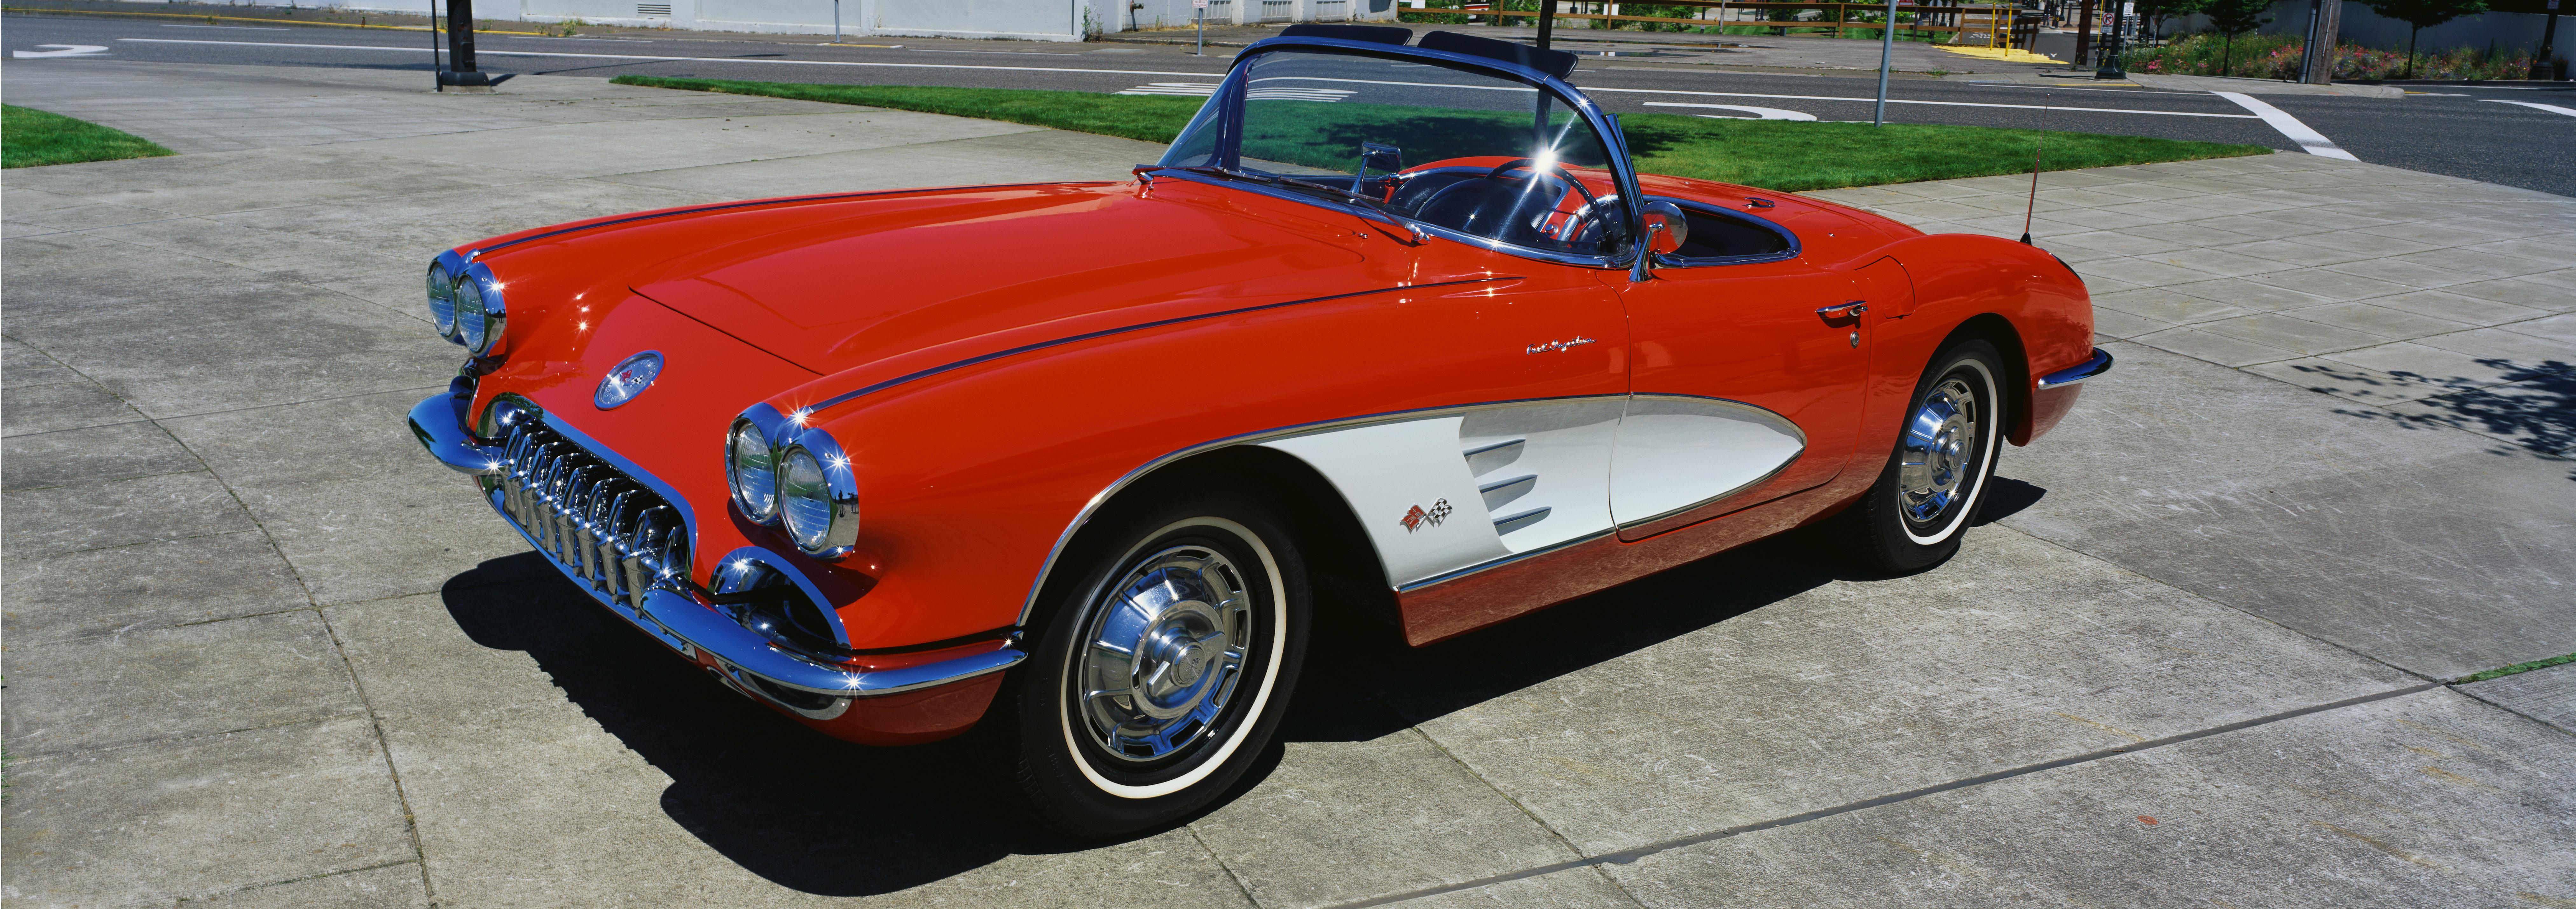 Chevy Corvette: America's First Sports Car